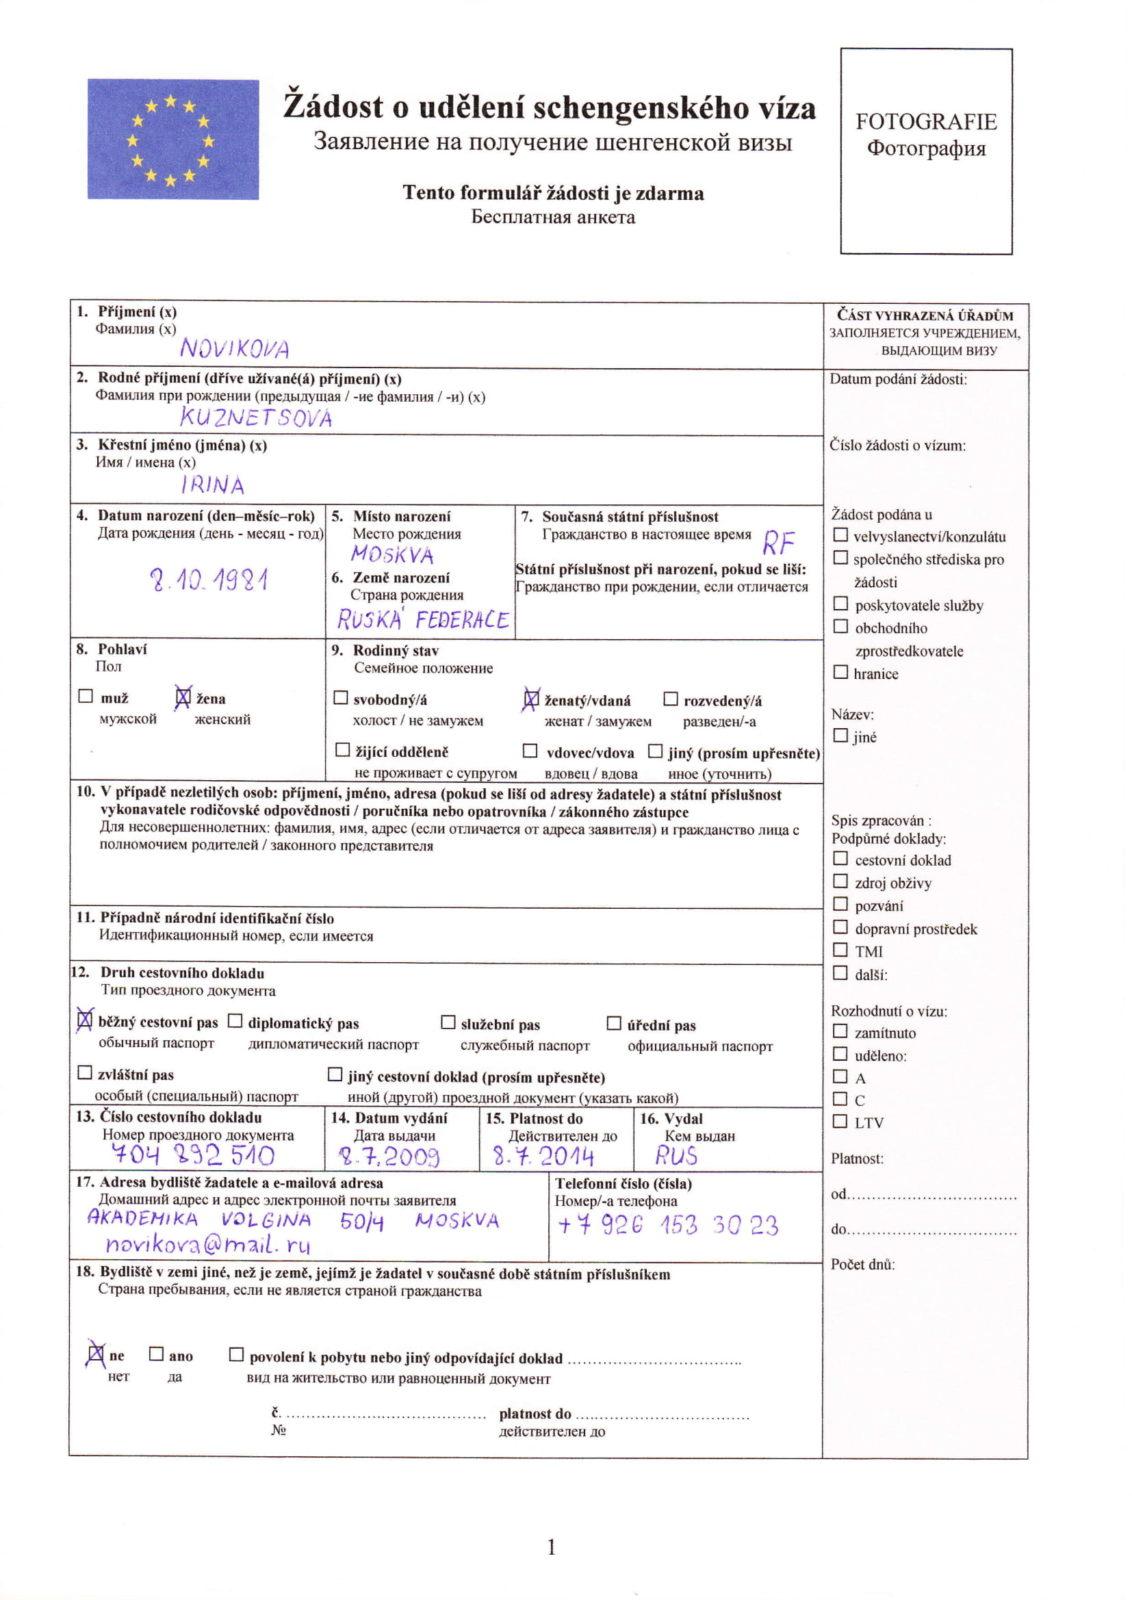 анкета_чехия_1